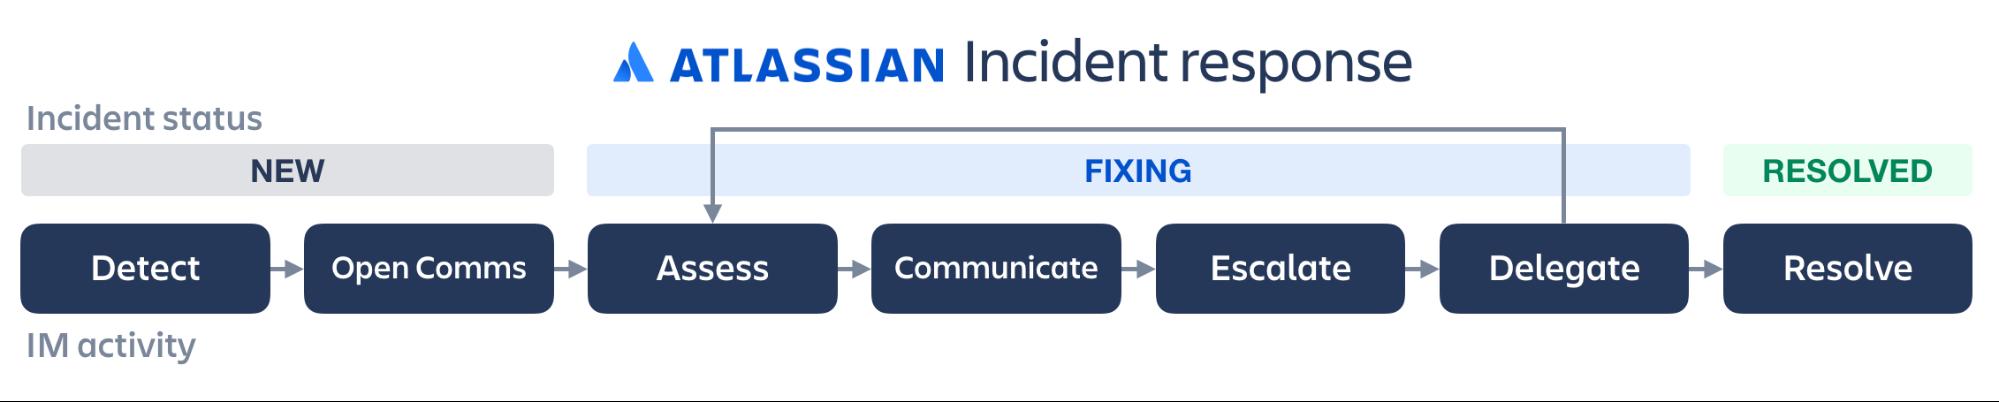 Incident response illustration : detect, open comms, assess, communicate, escalate, delegate, resolve